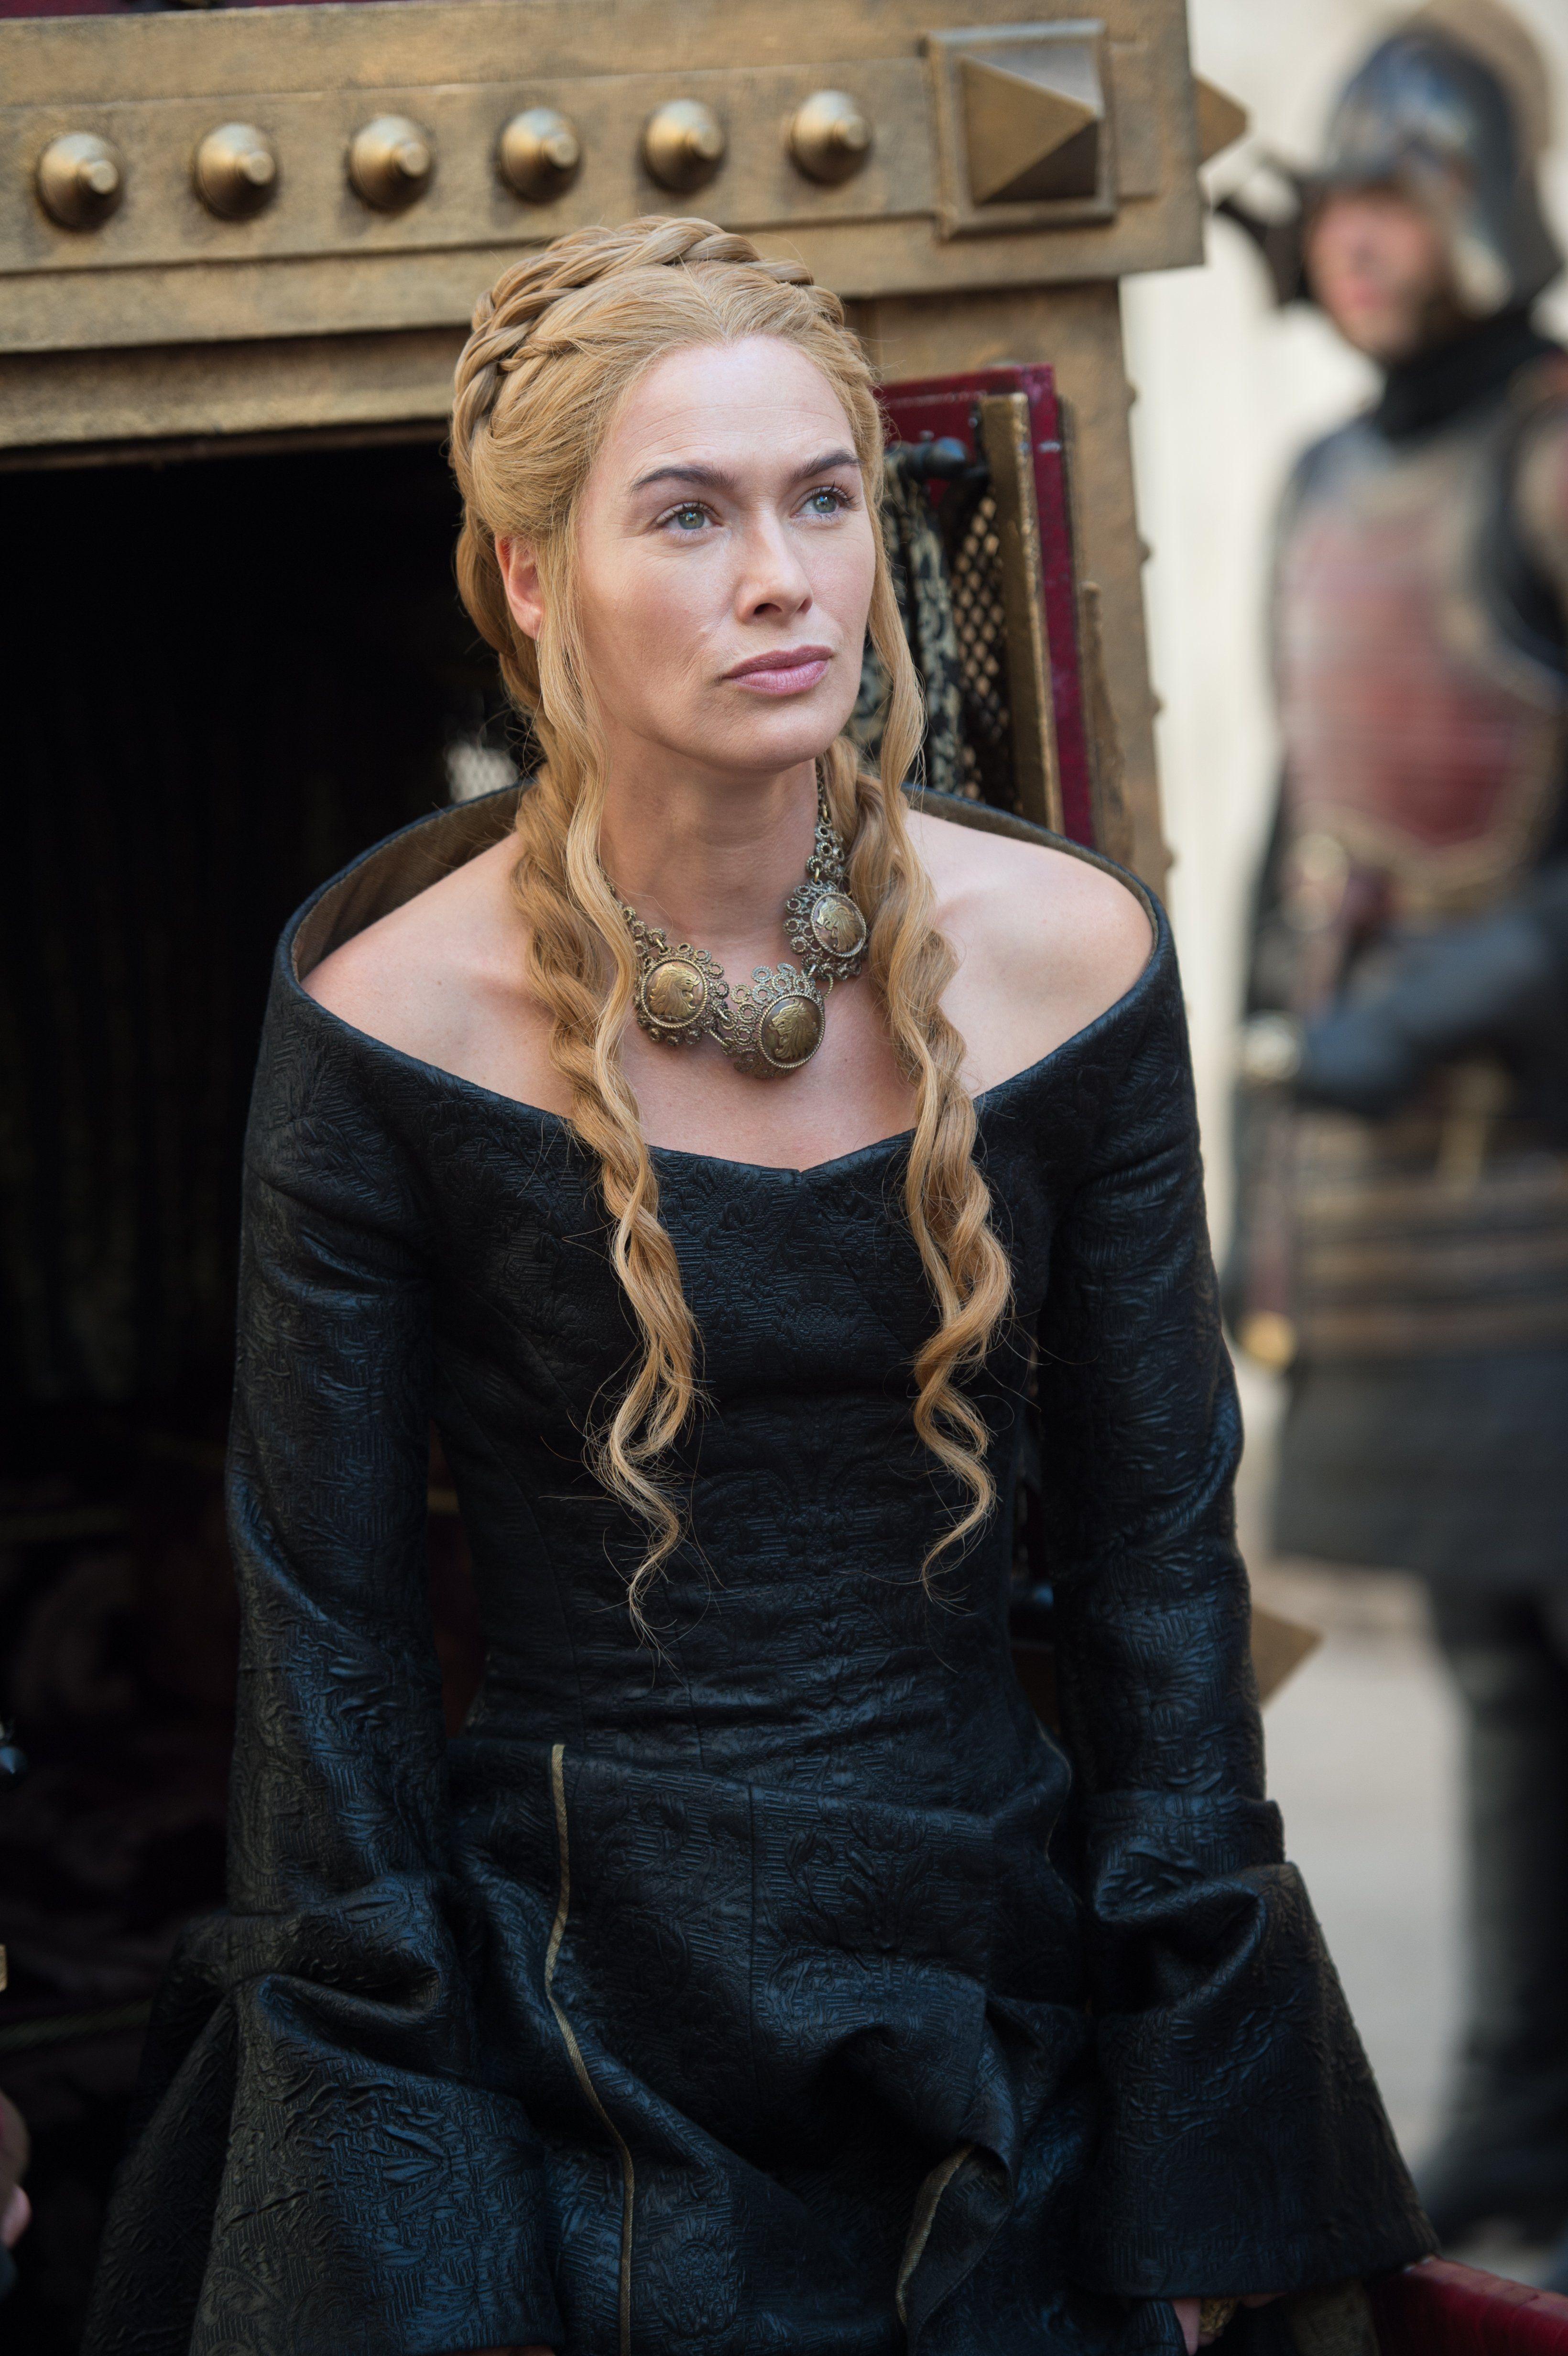 Game of Thrones Season 5 Episode 1 Costumes de cinéma